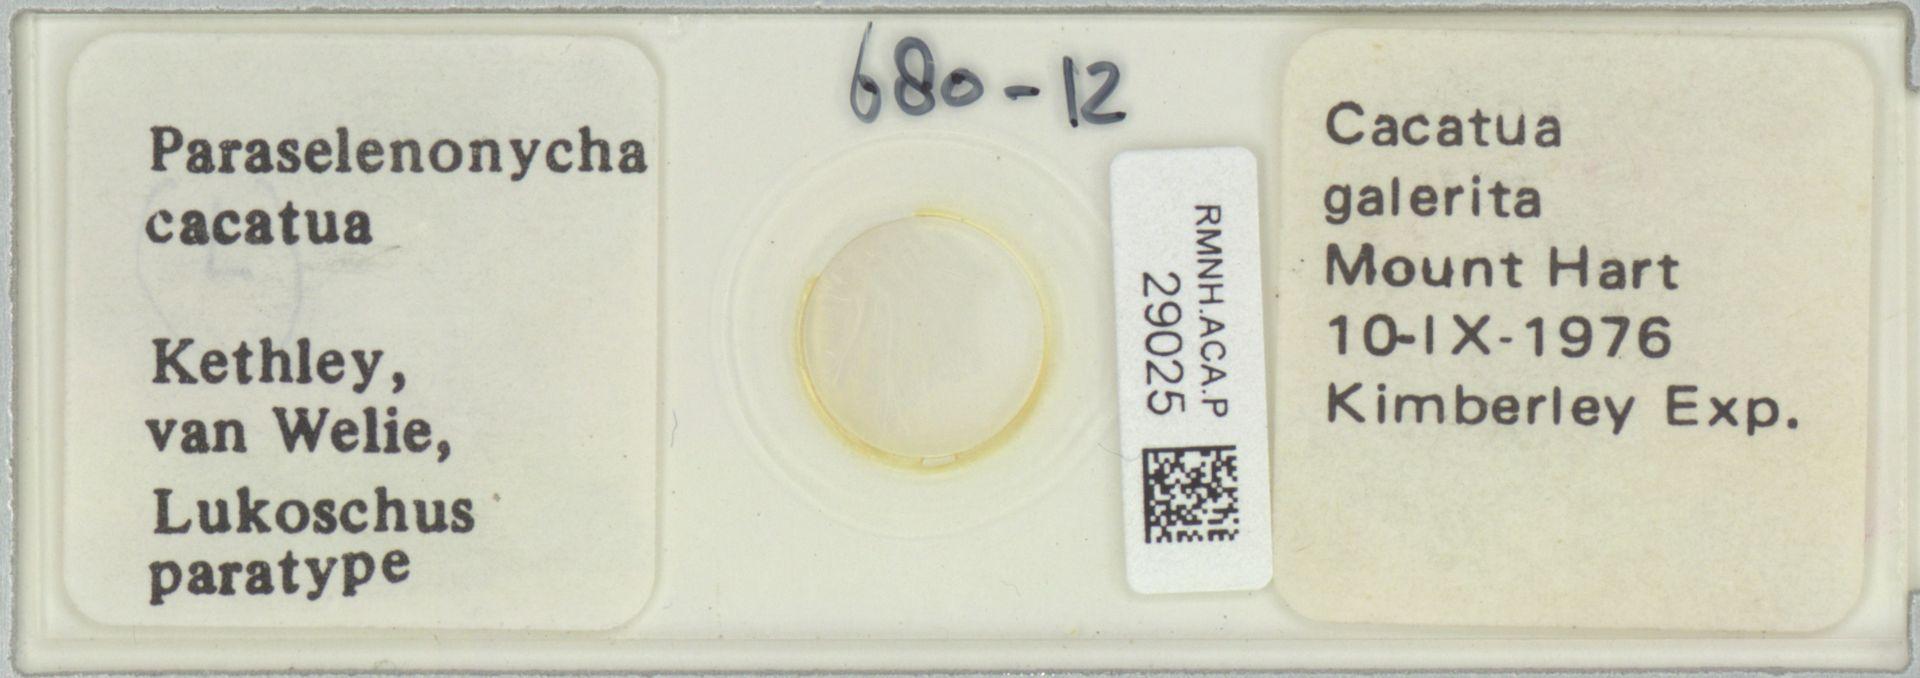 RMNH.ACA.P.29025 | Paraselenonycha cacatua Kethley, van Welie, Lukoschus